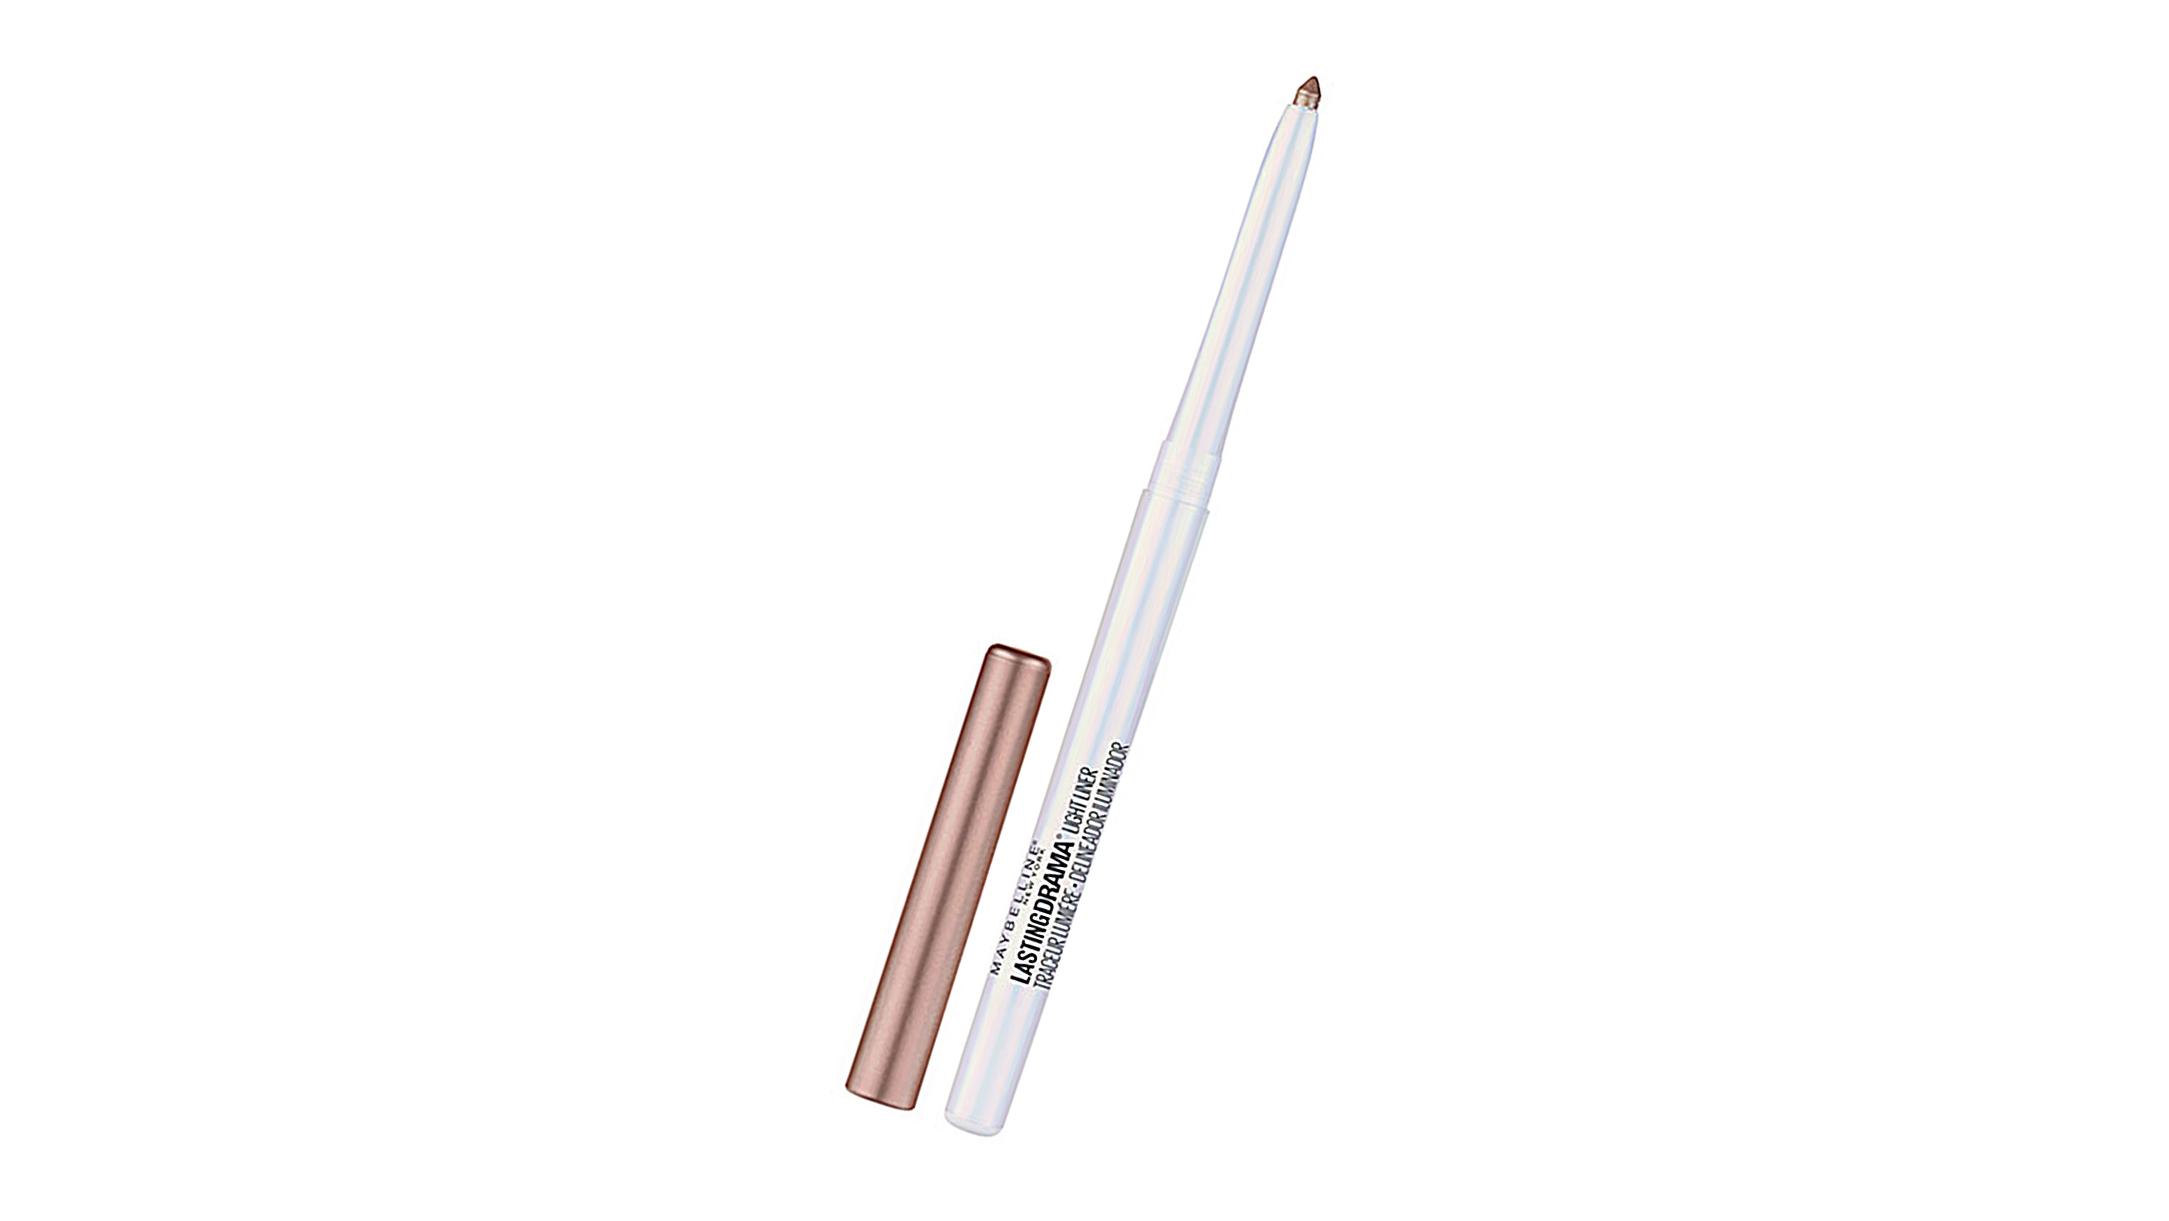 beauty product maybelline eyeliner